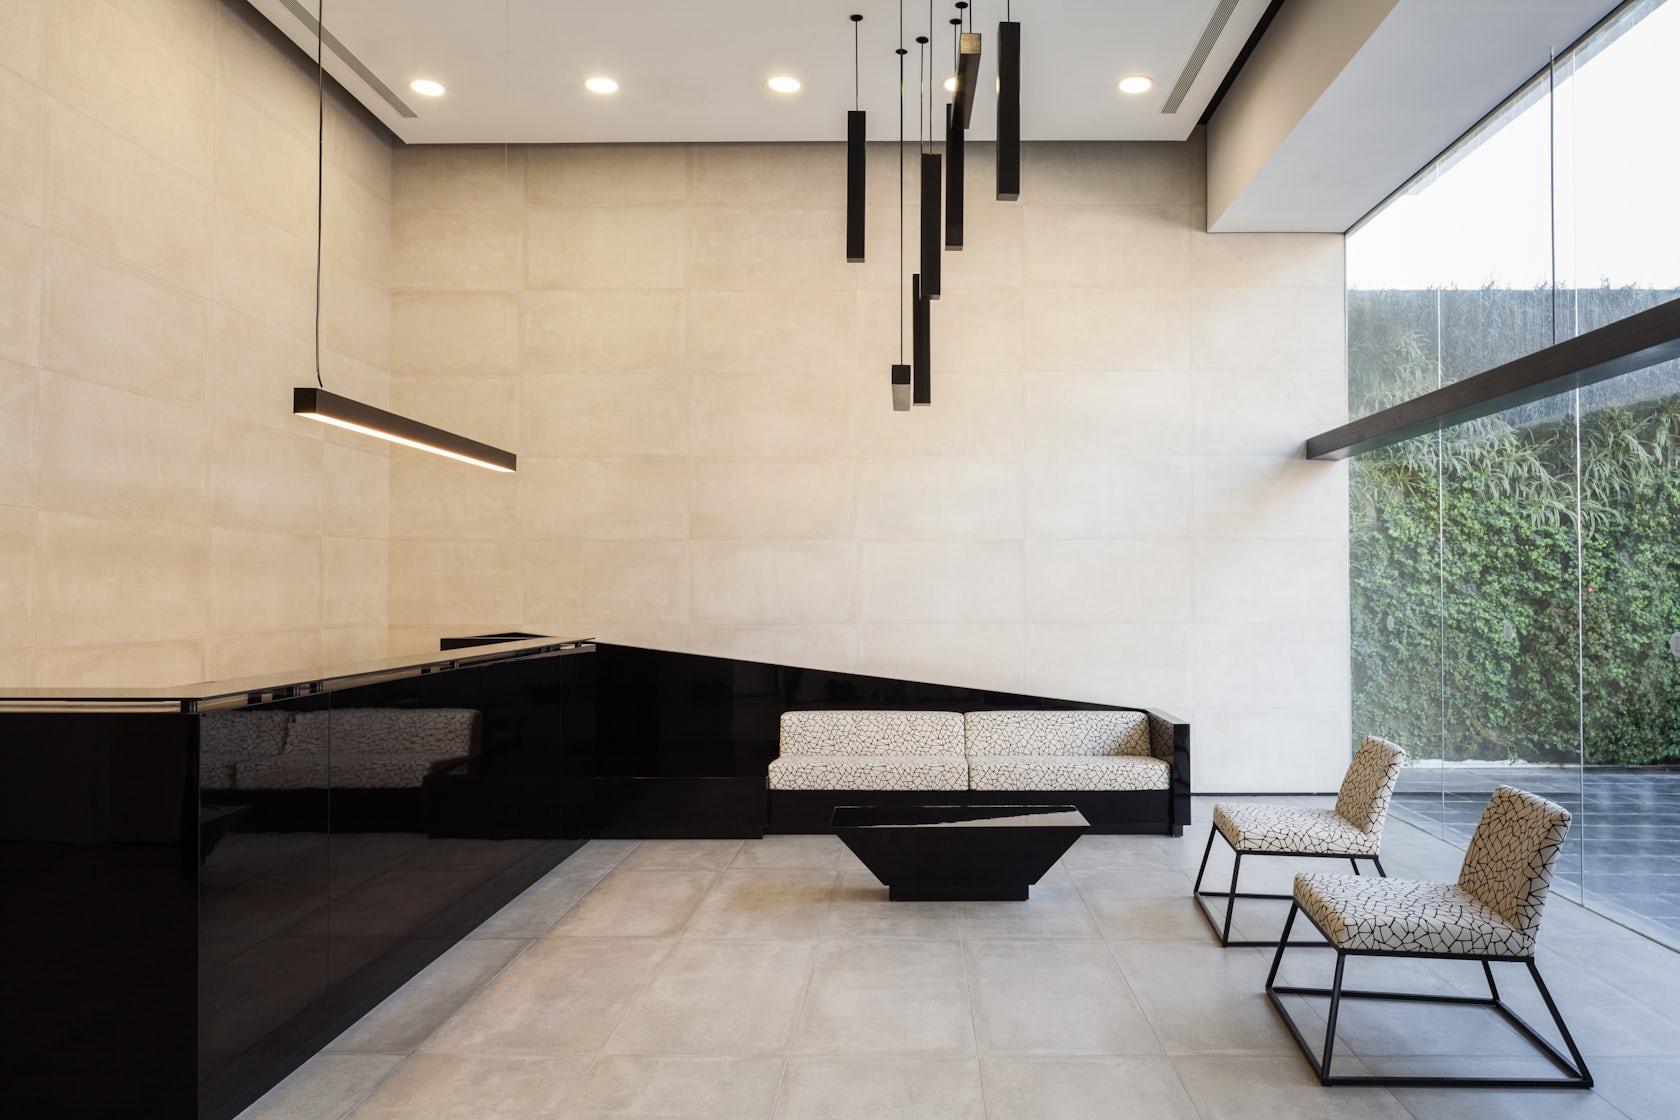 An Office Building Interior Design Architizer